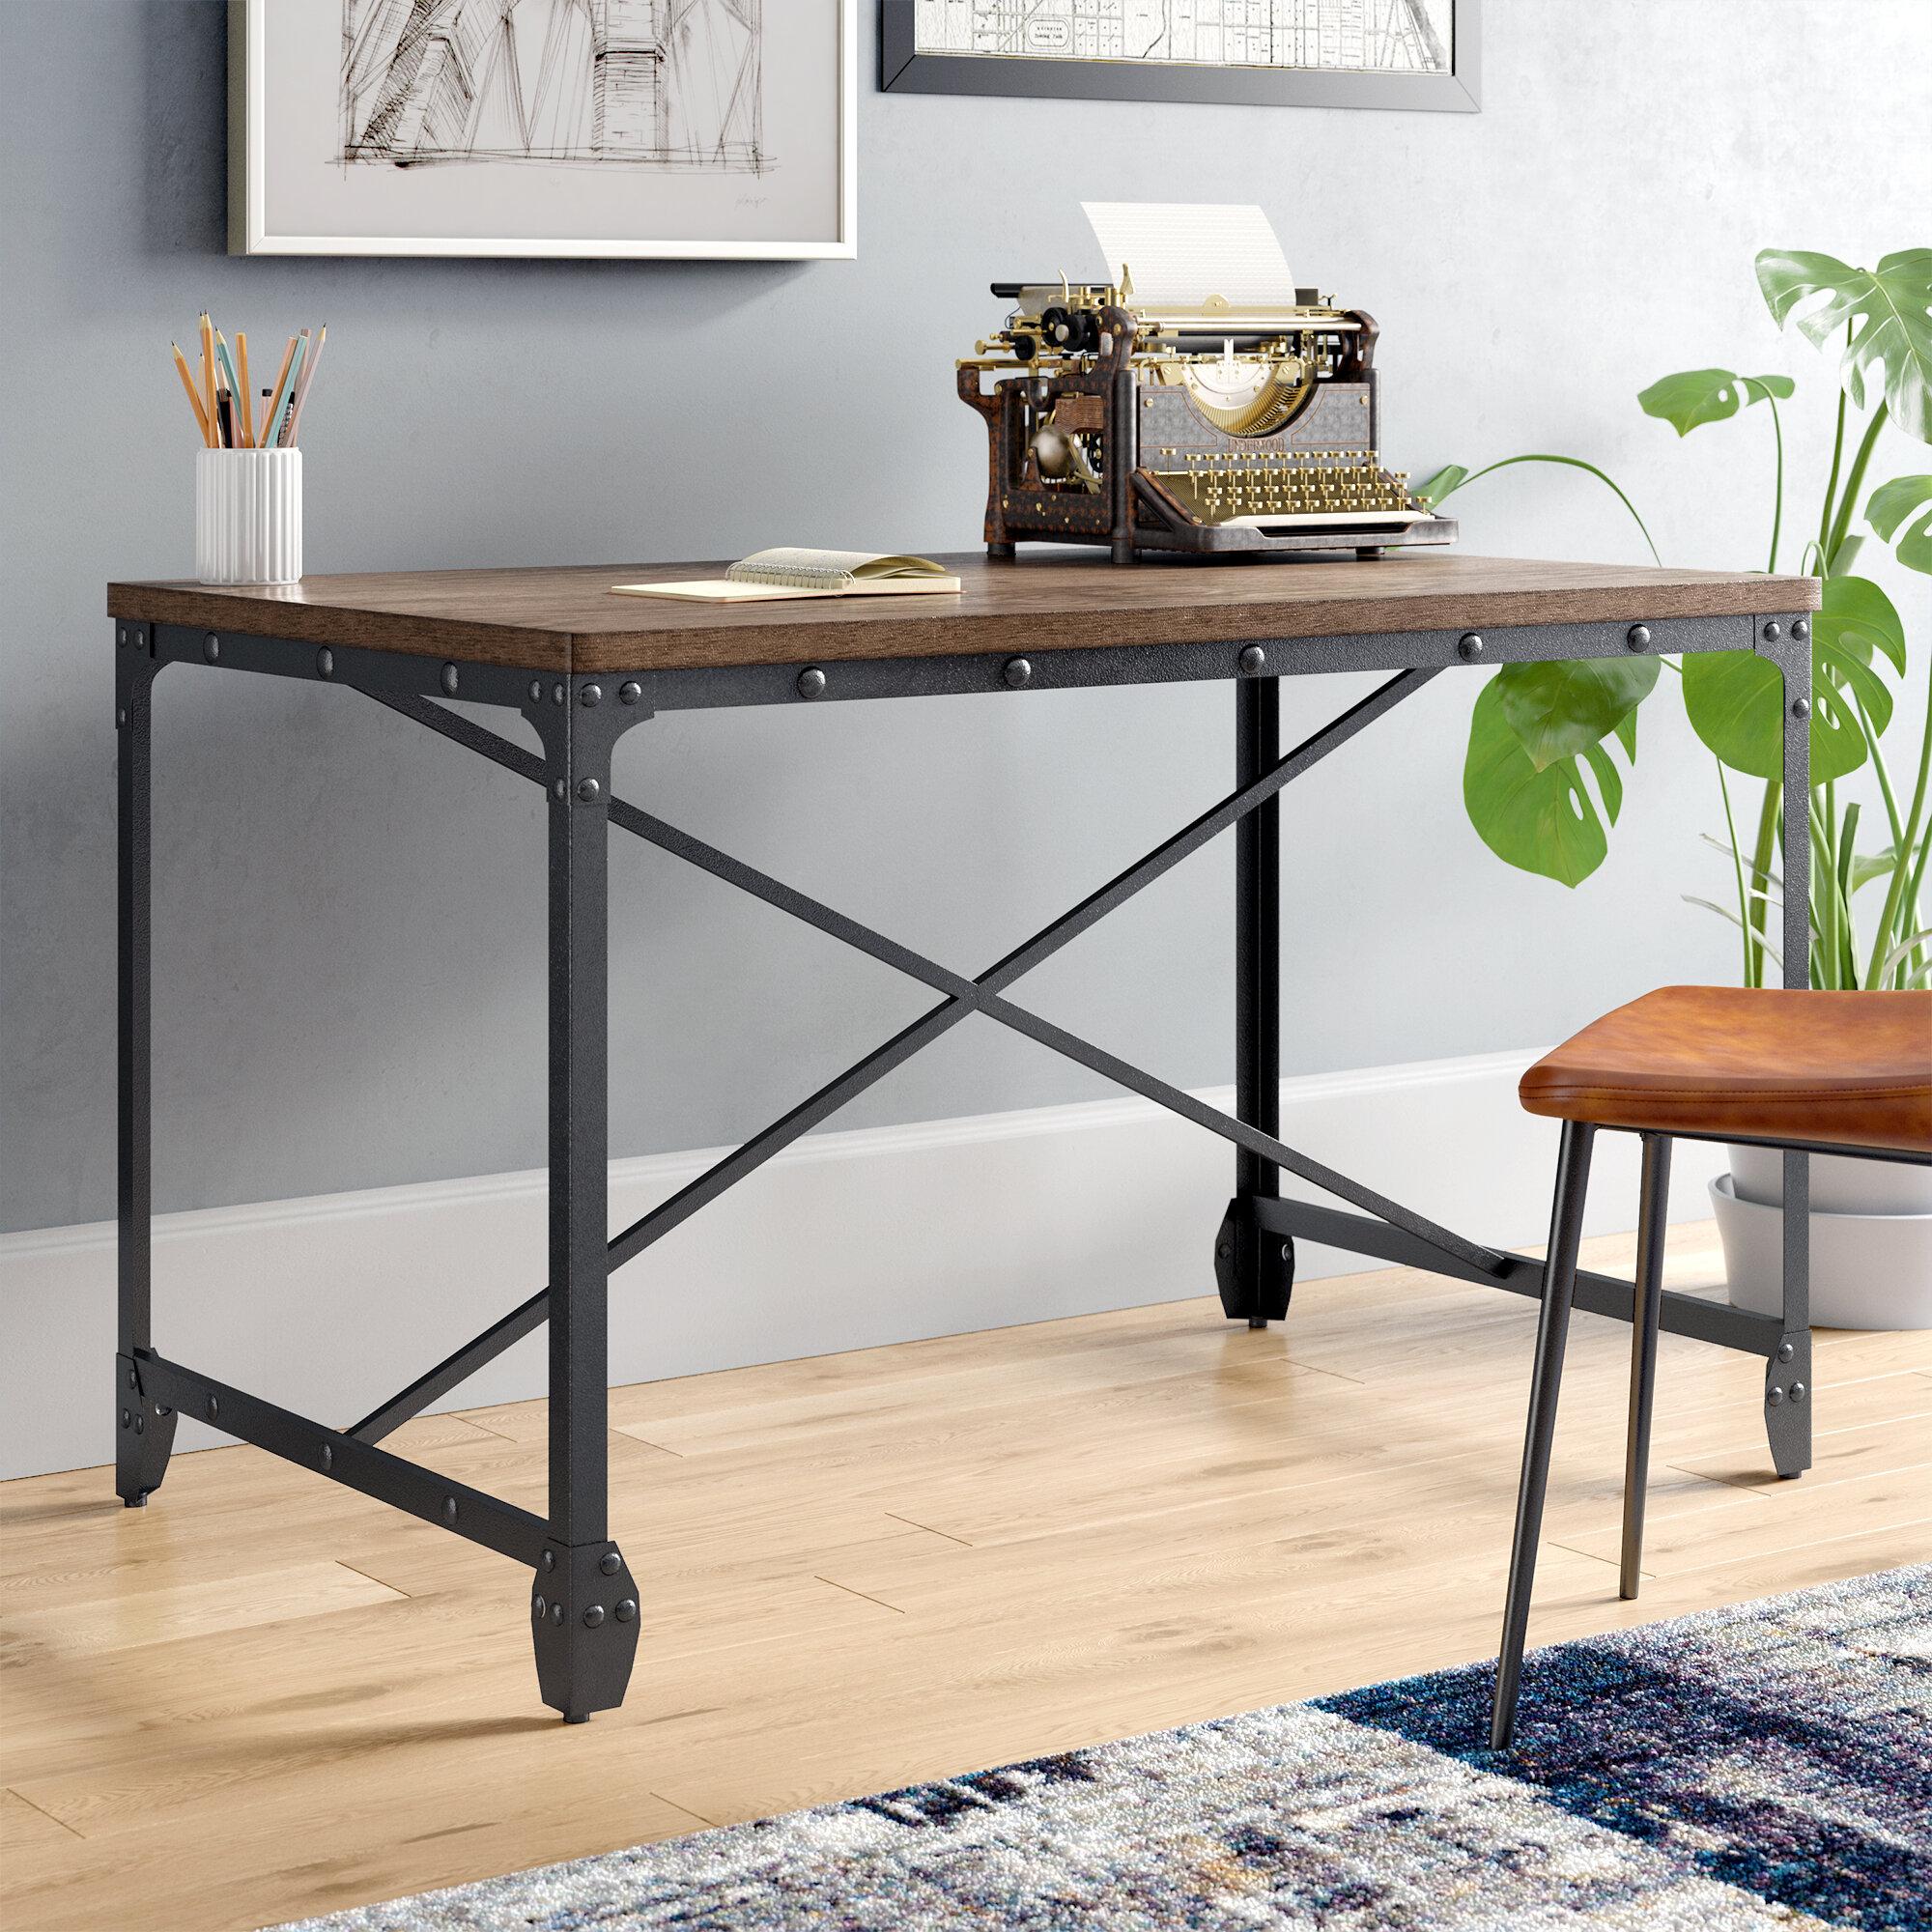 image on product sale jakob furniture silo desk writing download decorium